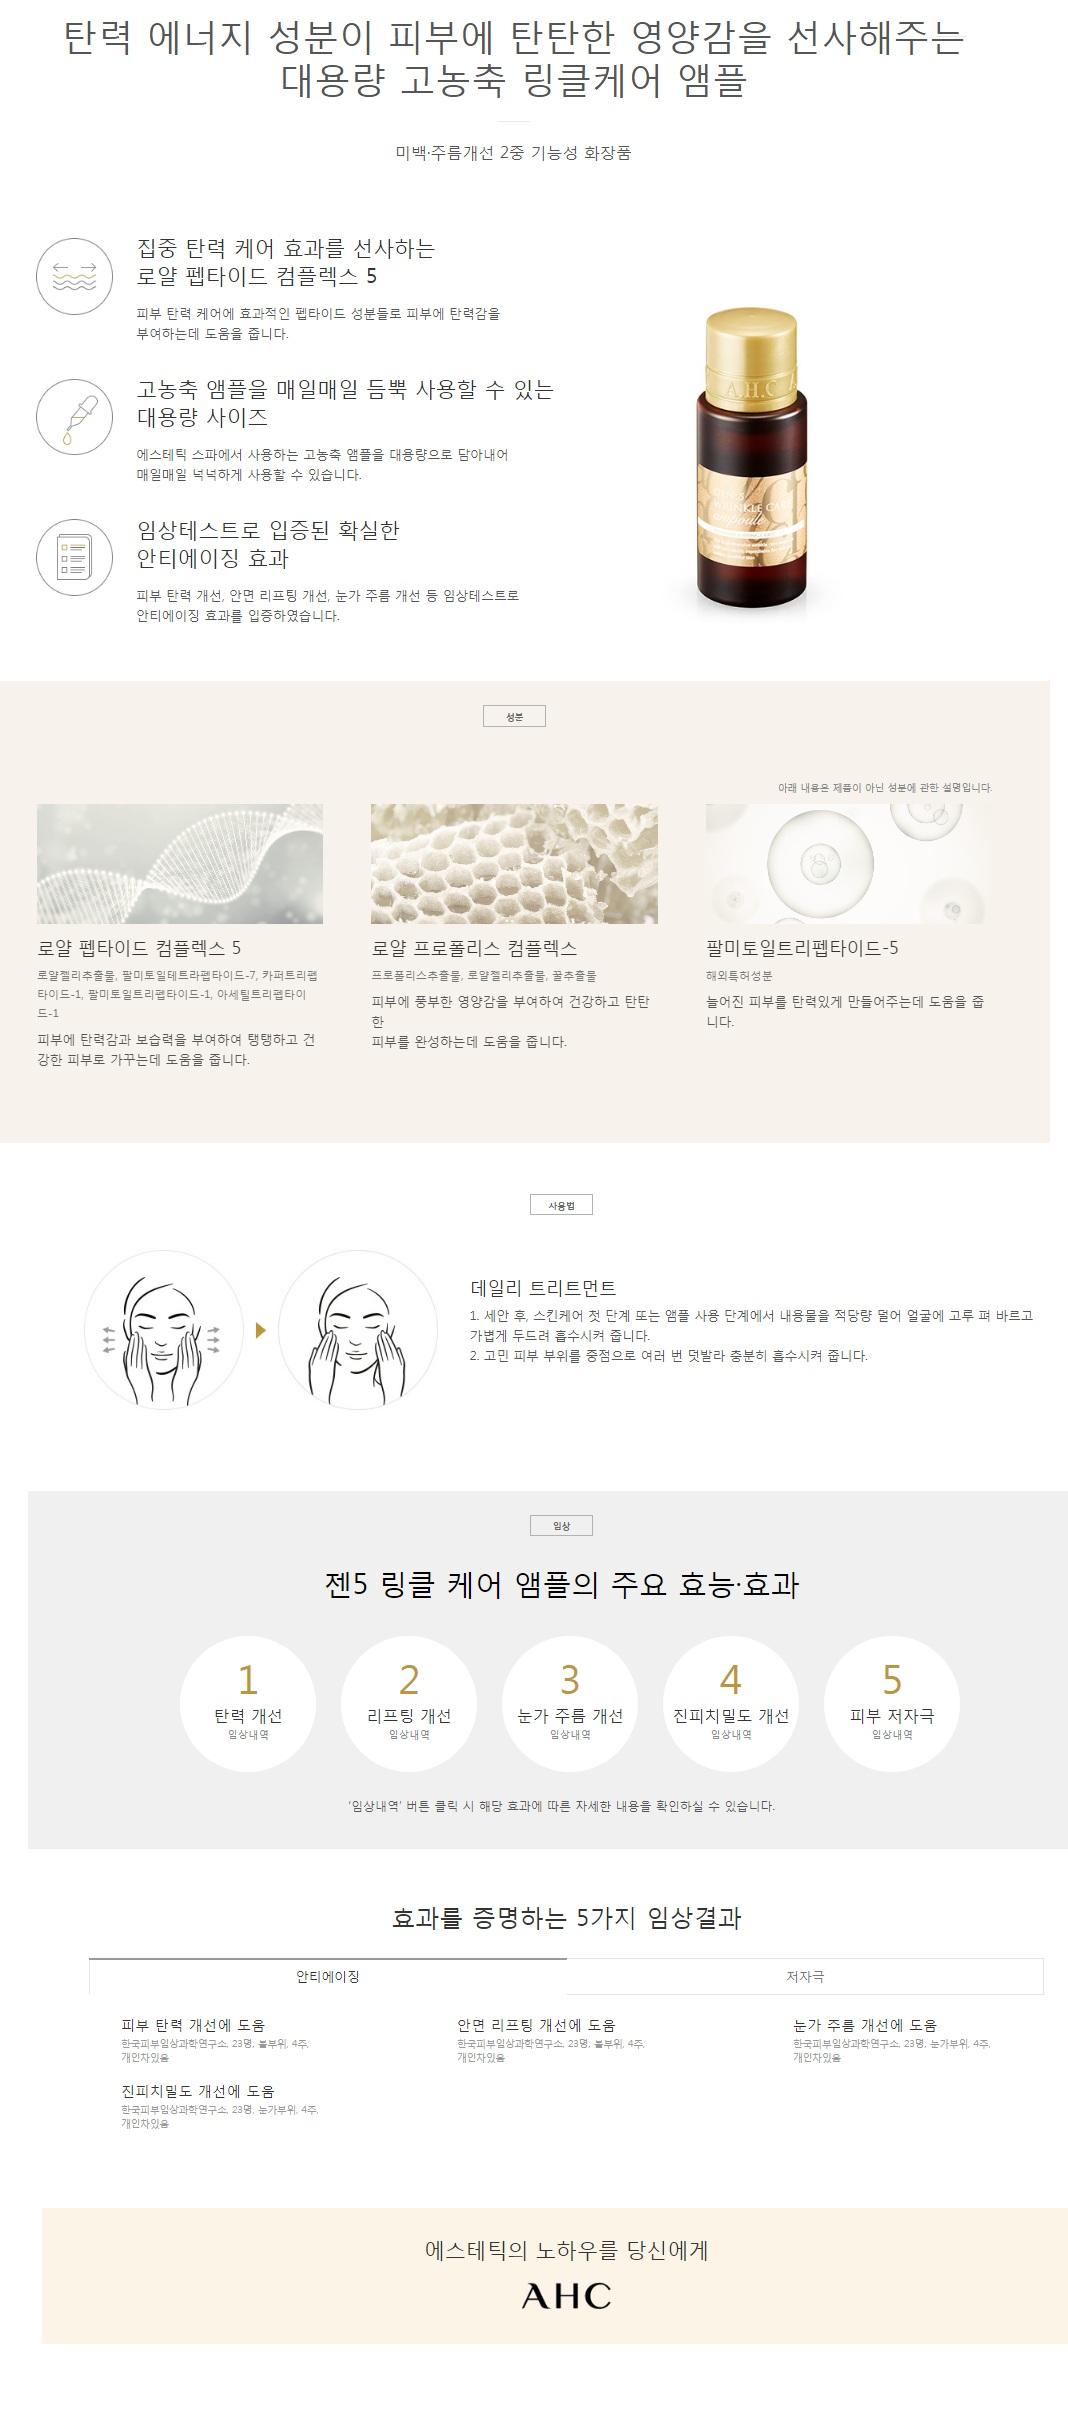 AHC Gen 5 Wrinkle Care Ampoule 50ml korean cosmetic skincare product online shop malaysia Macau Brunei1